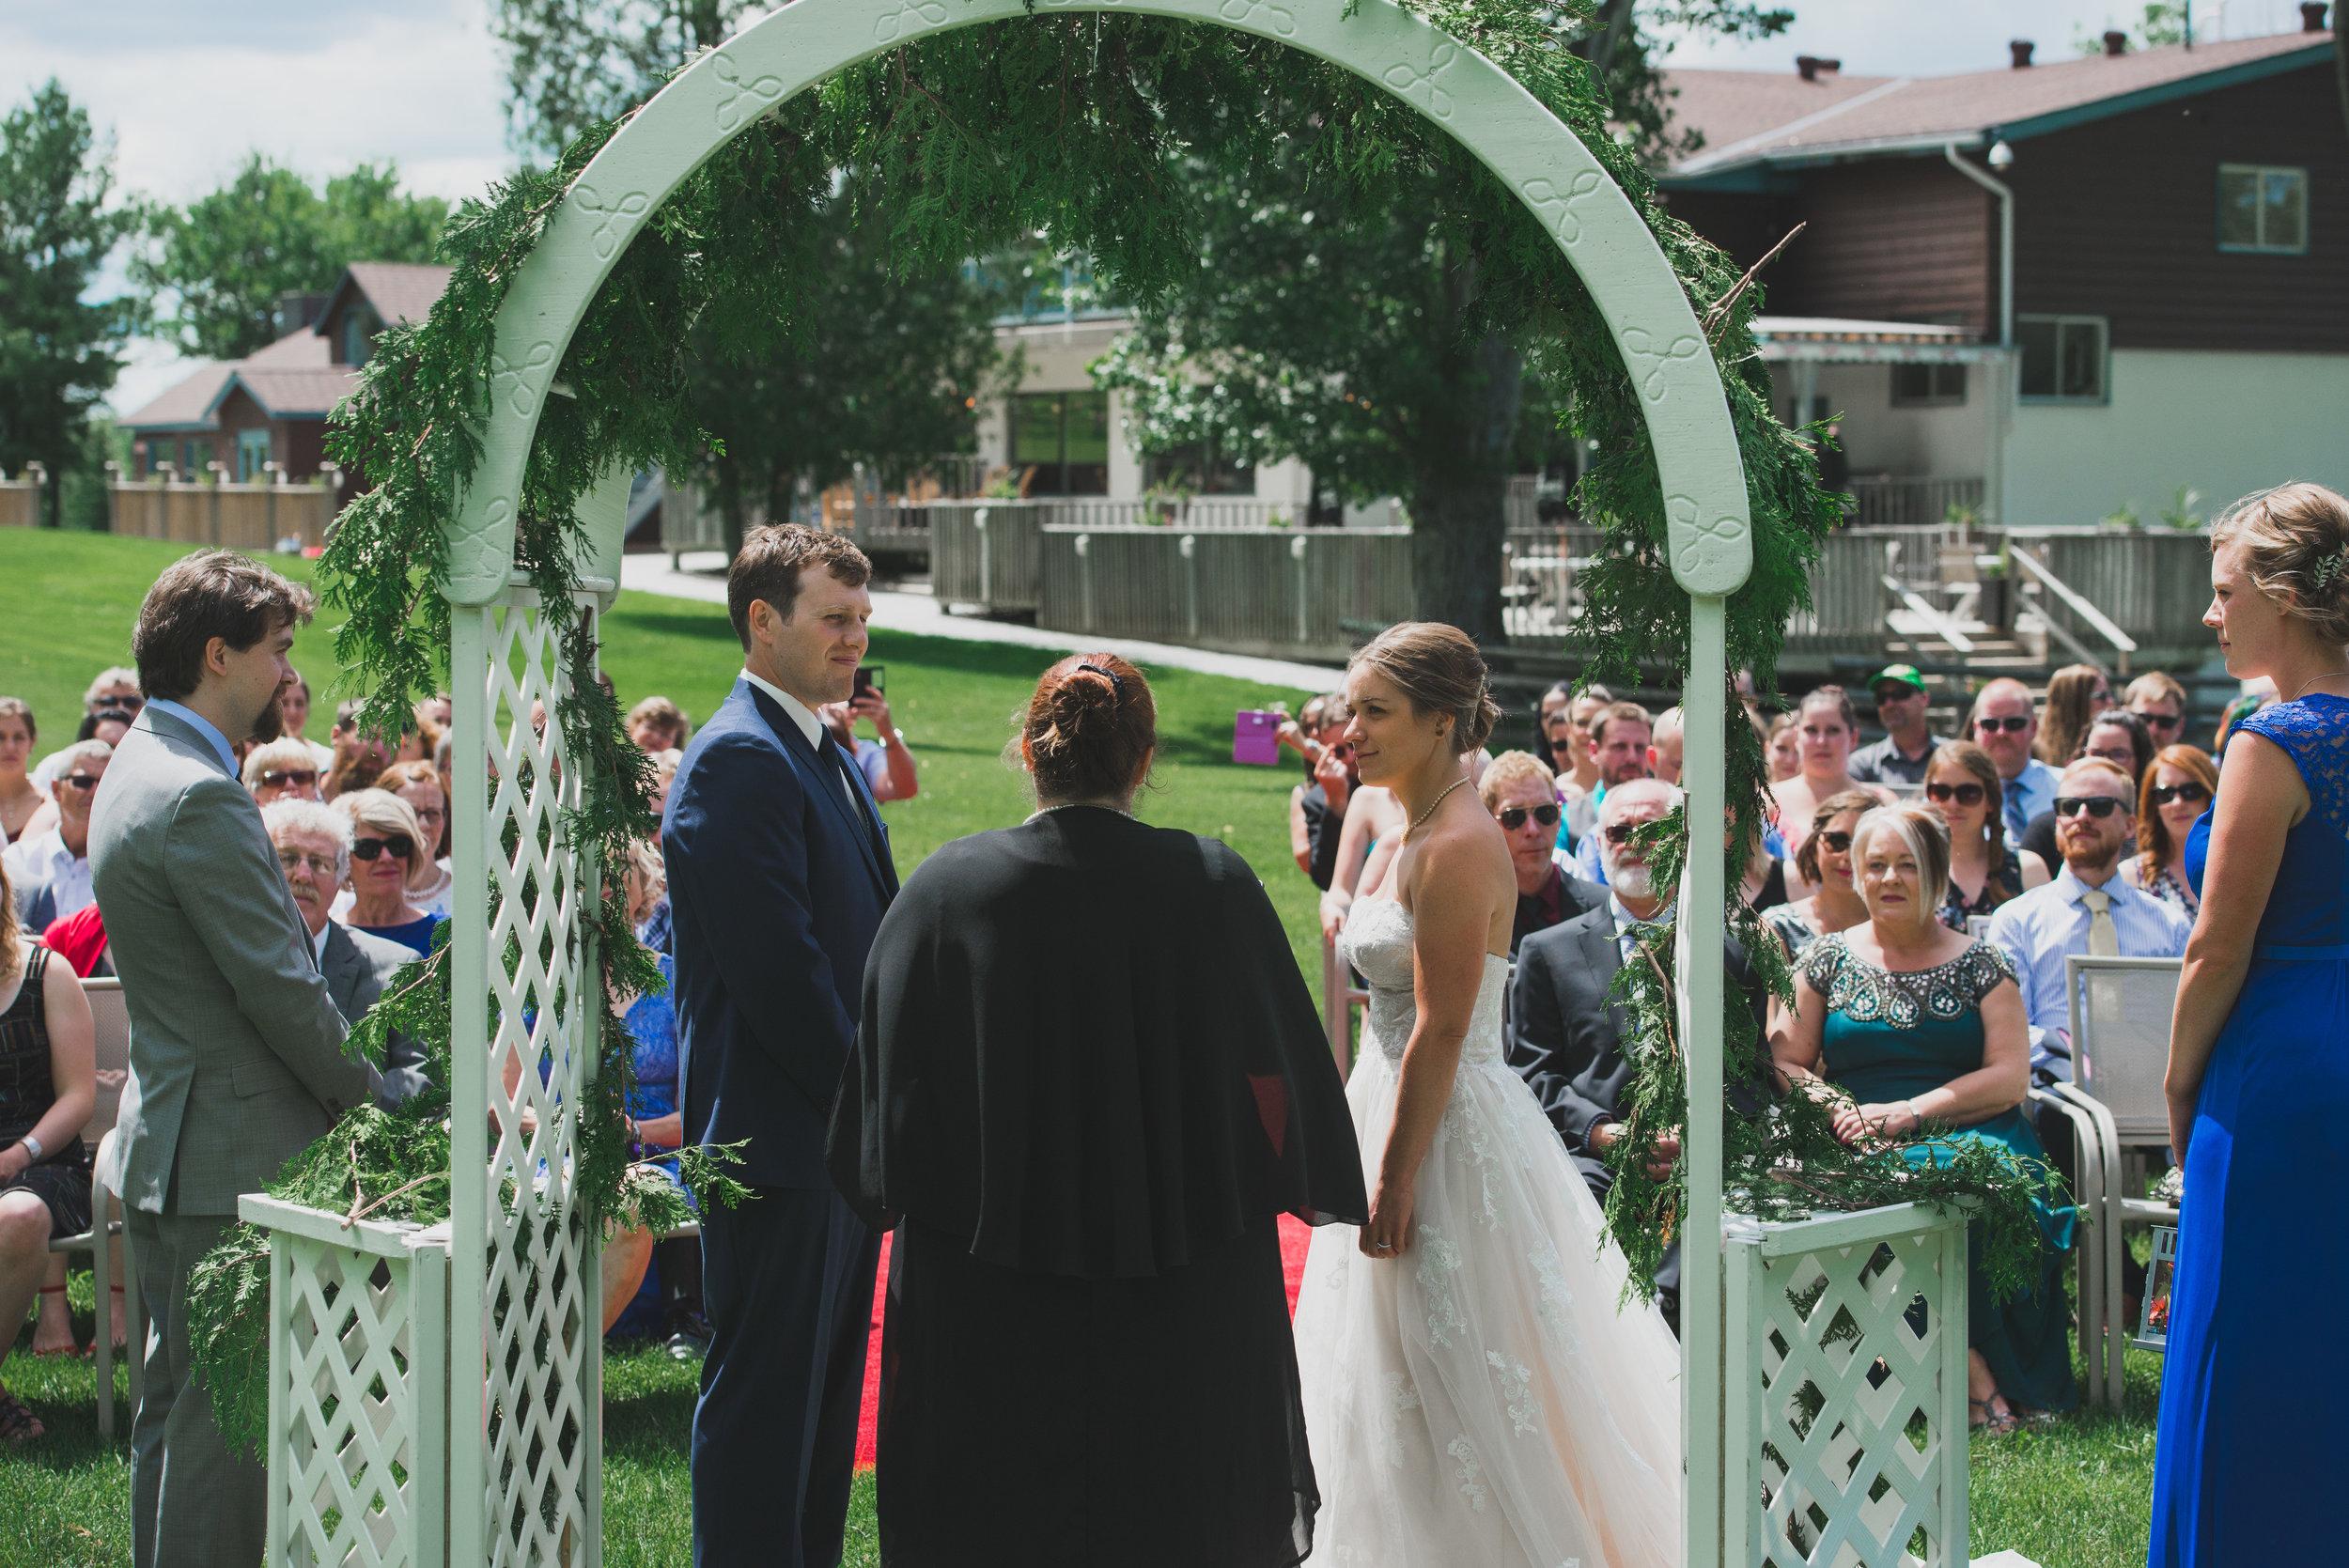 SheriCorey-Wedding-June242017-Ceremony-00050.jpg